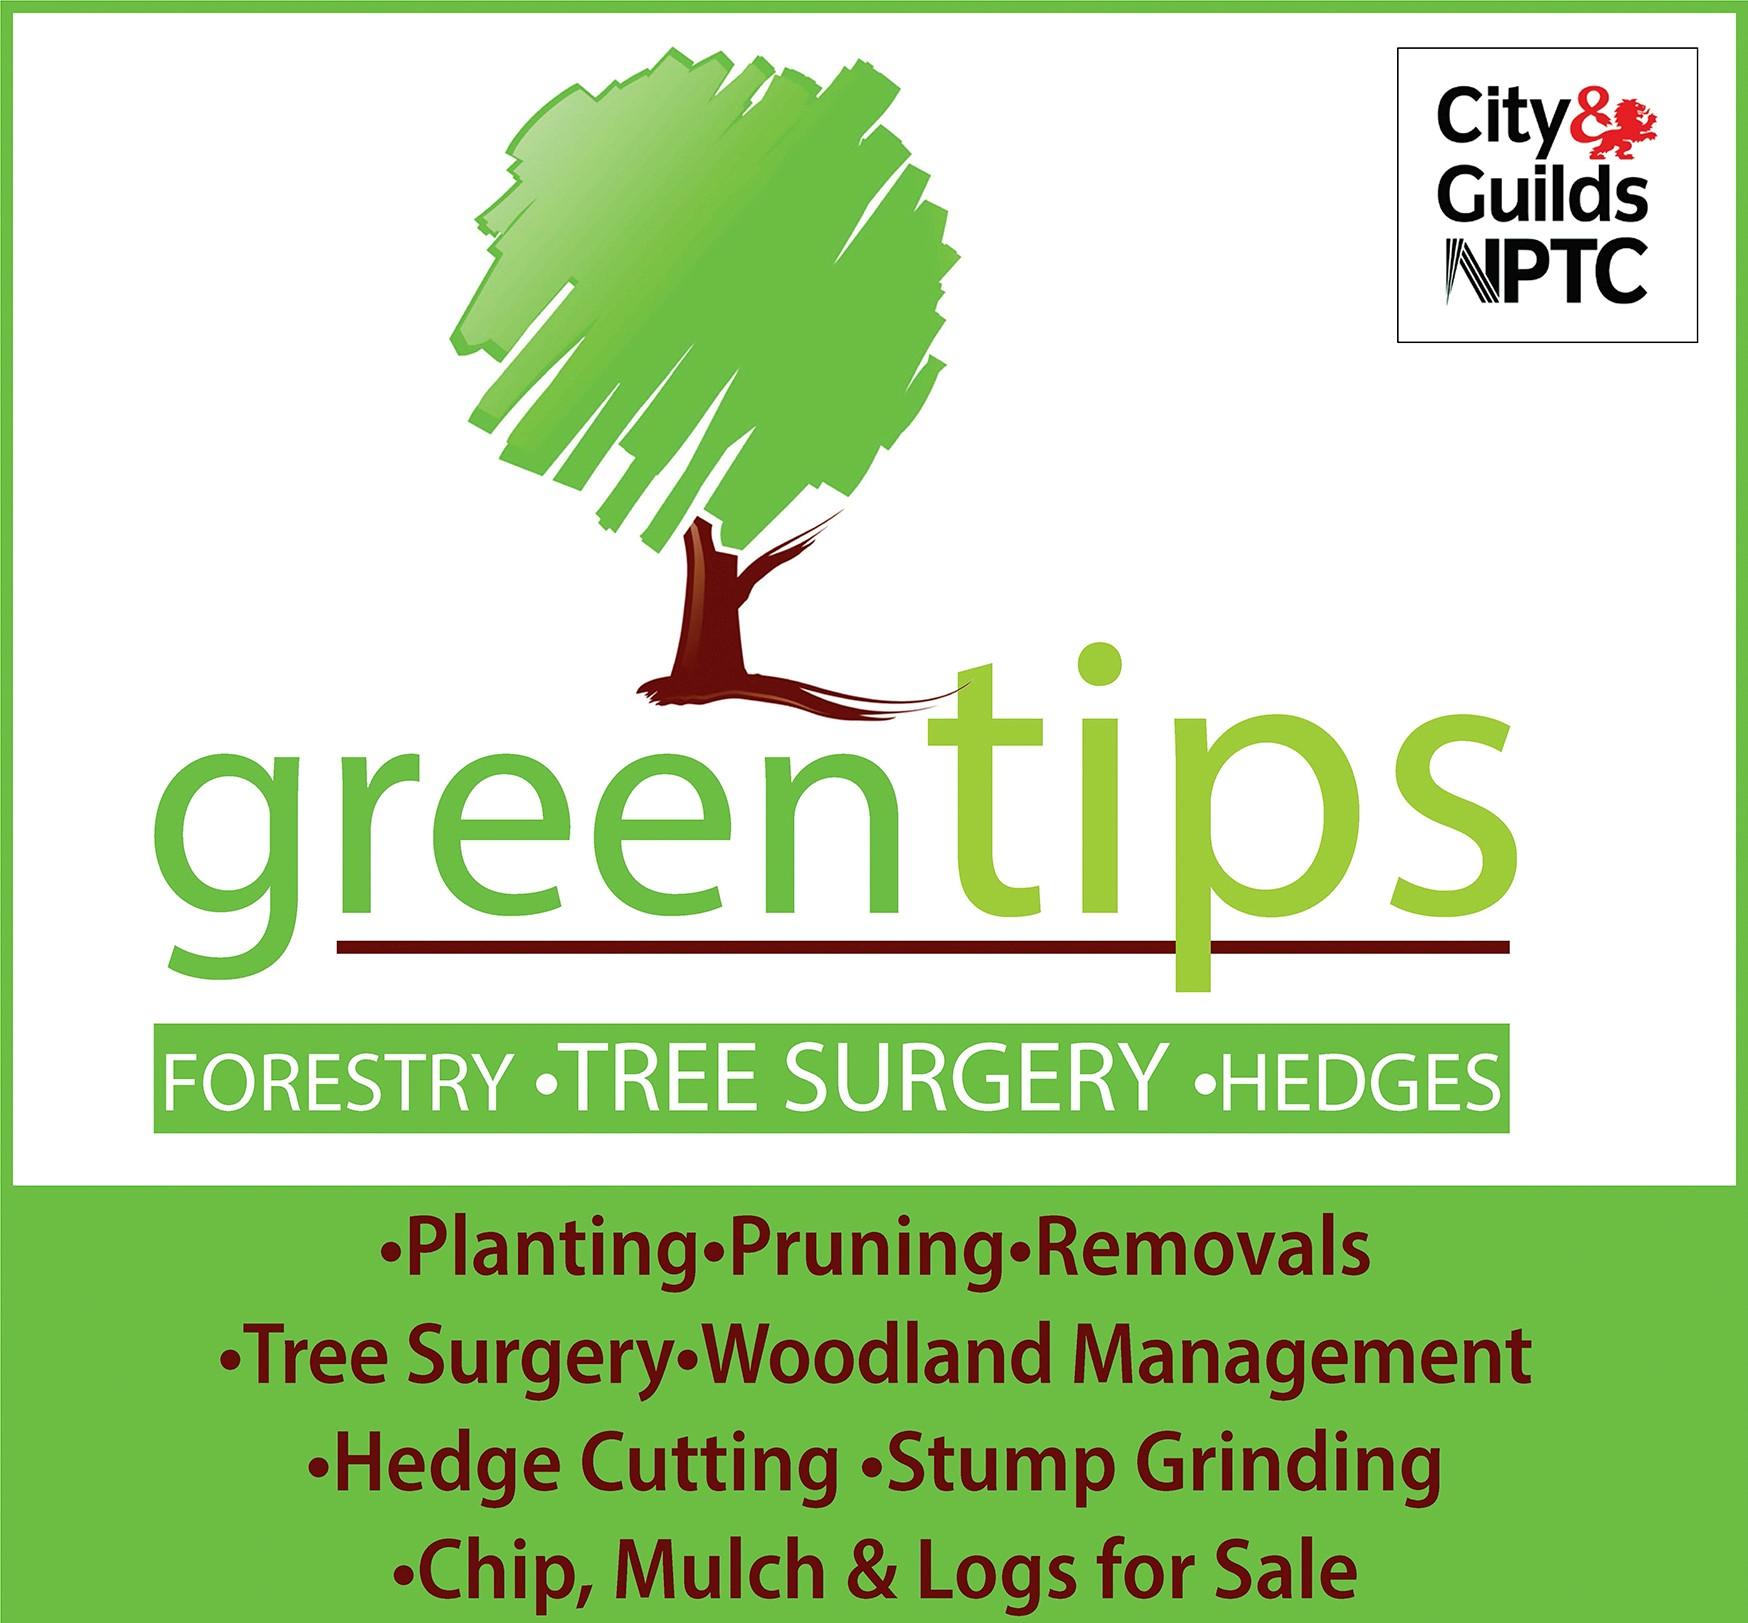 greenTips tree surgery